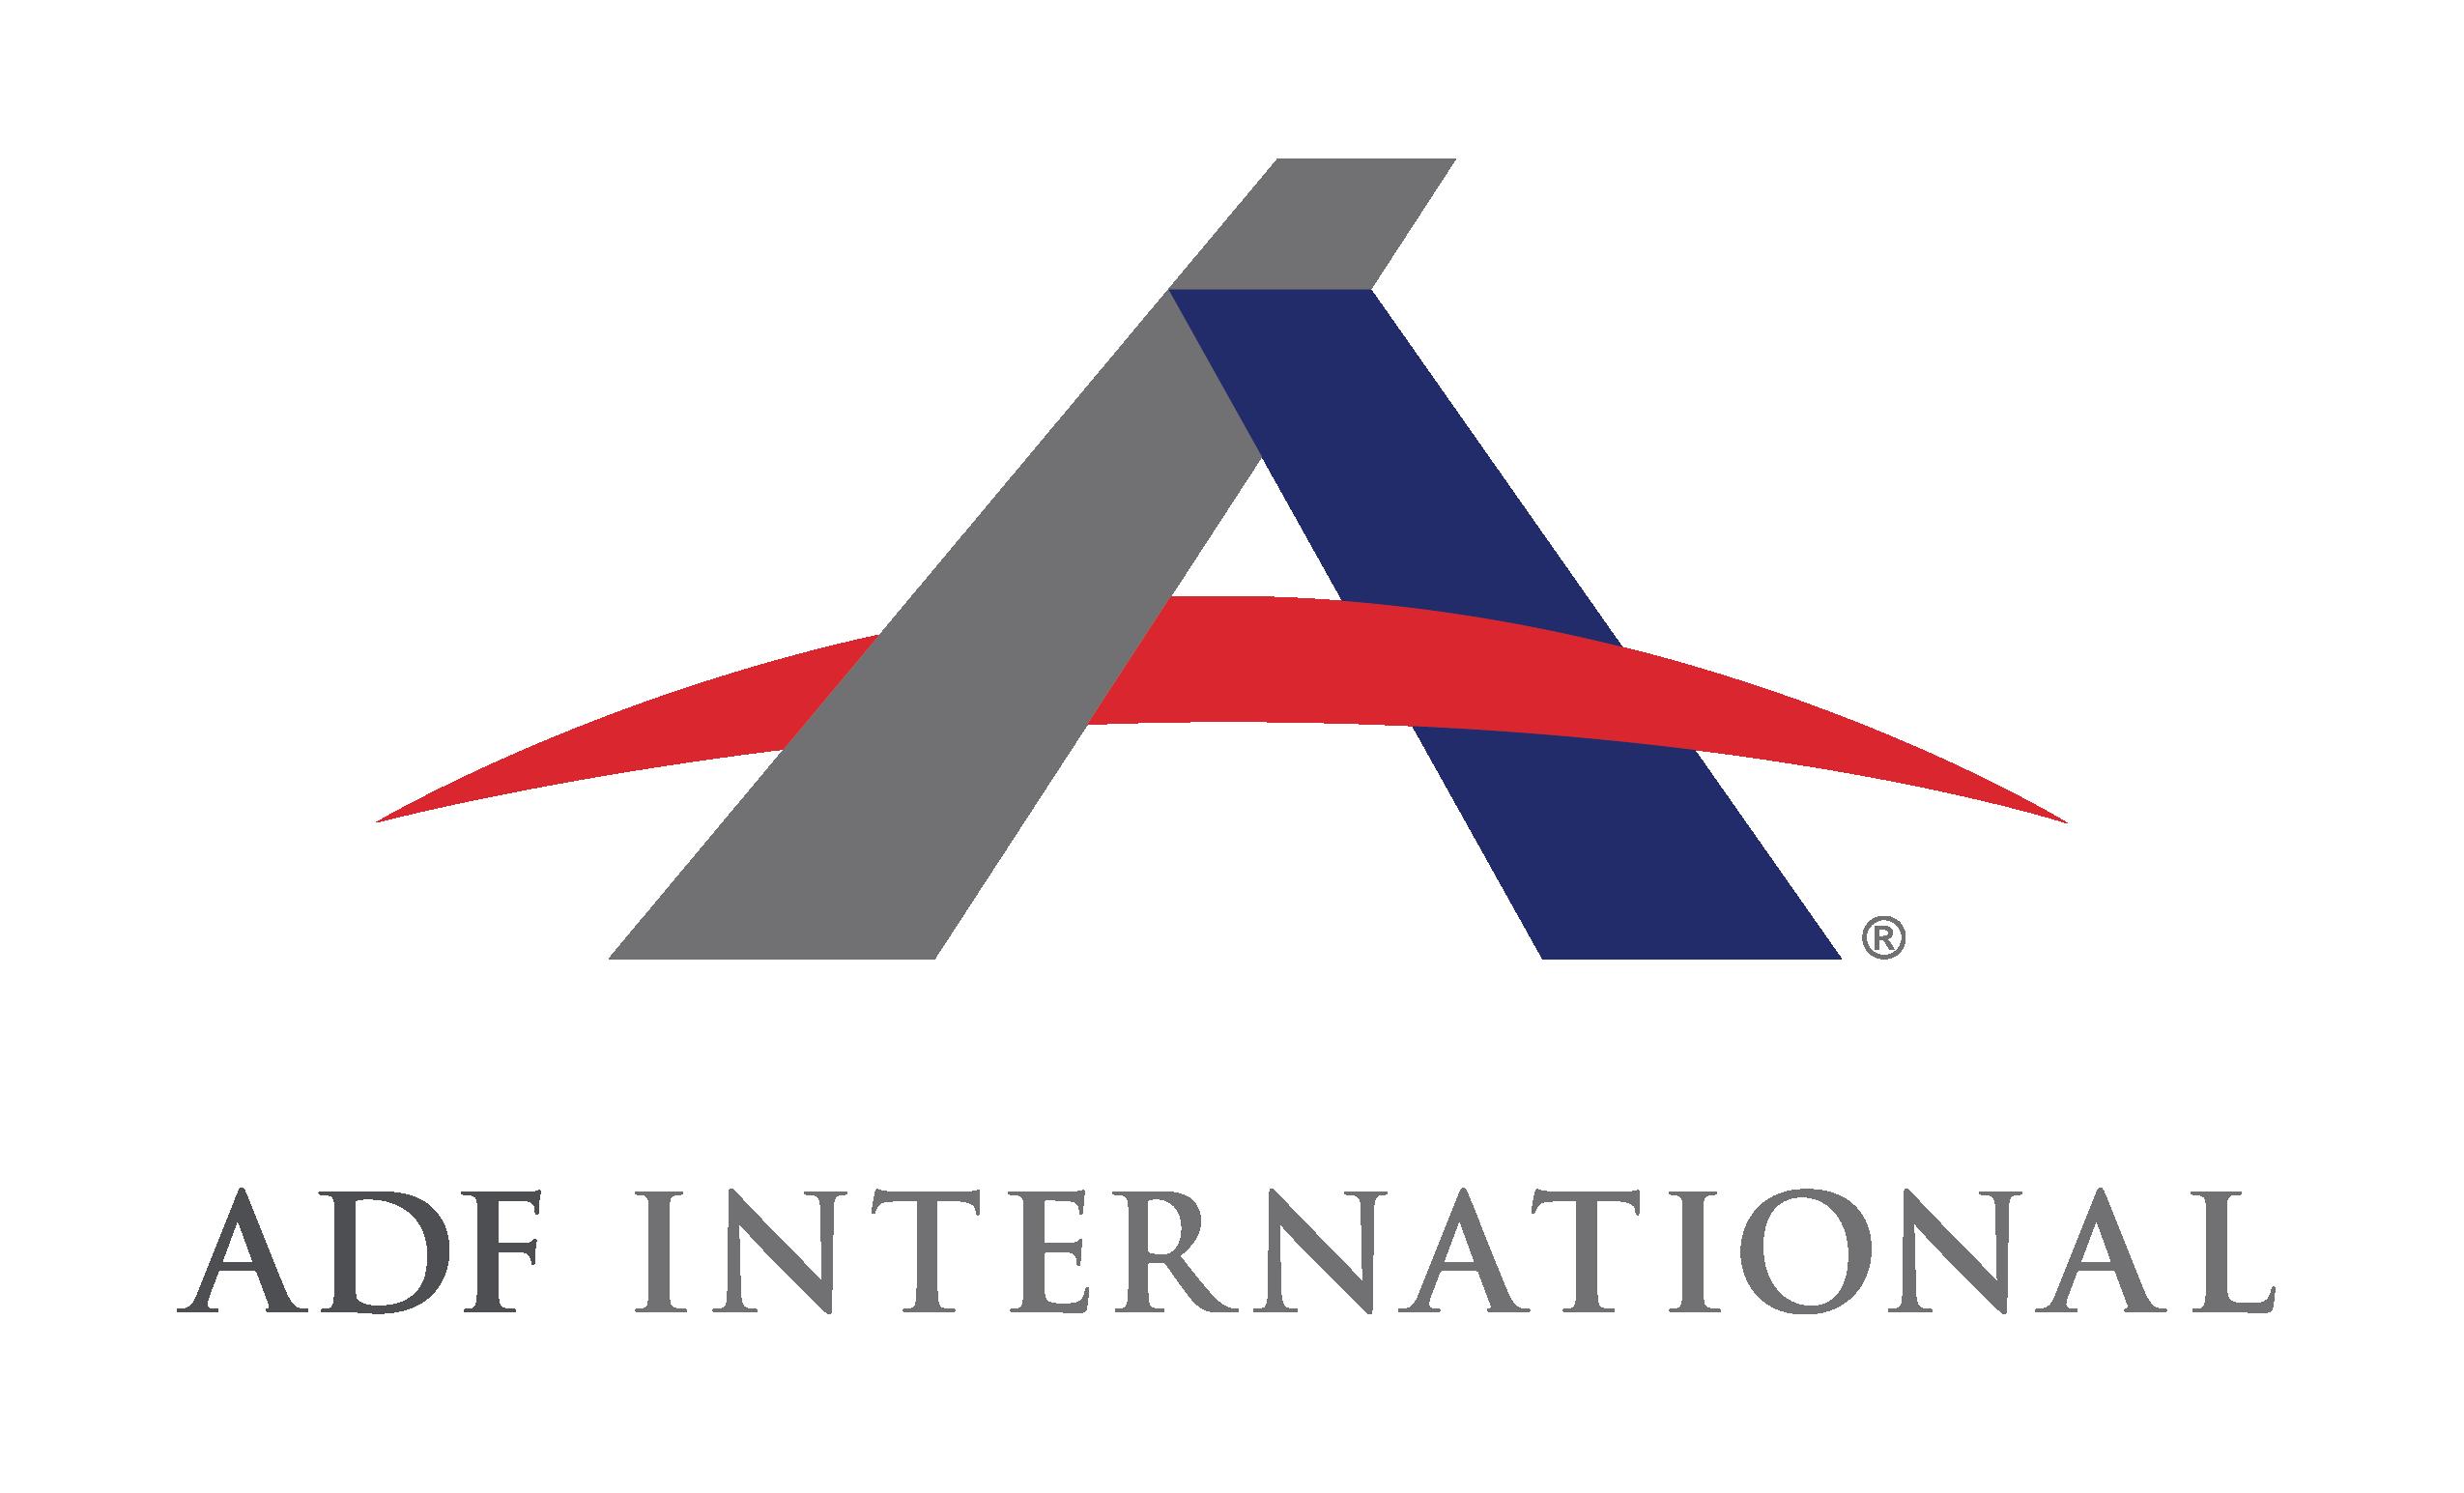 ADF International